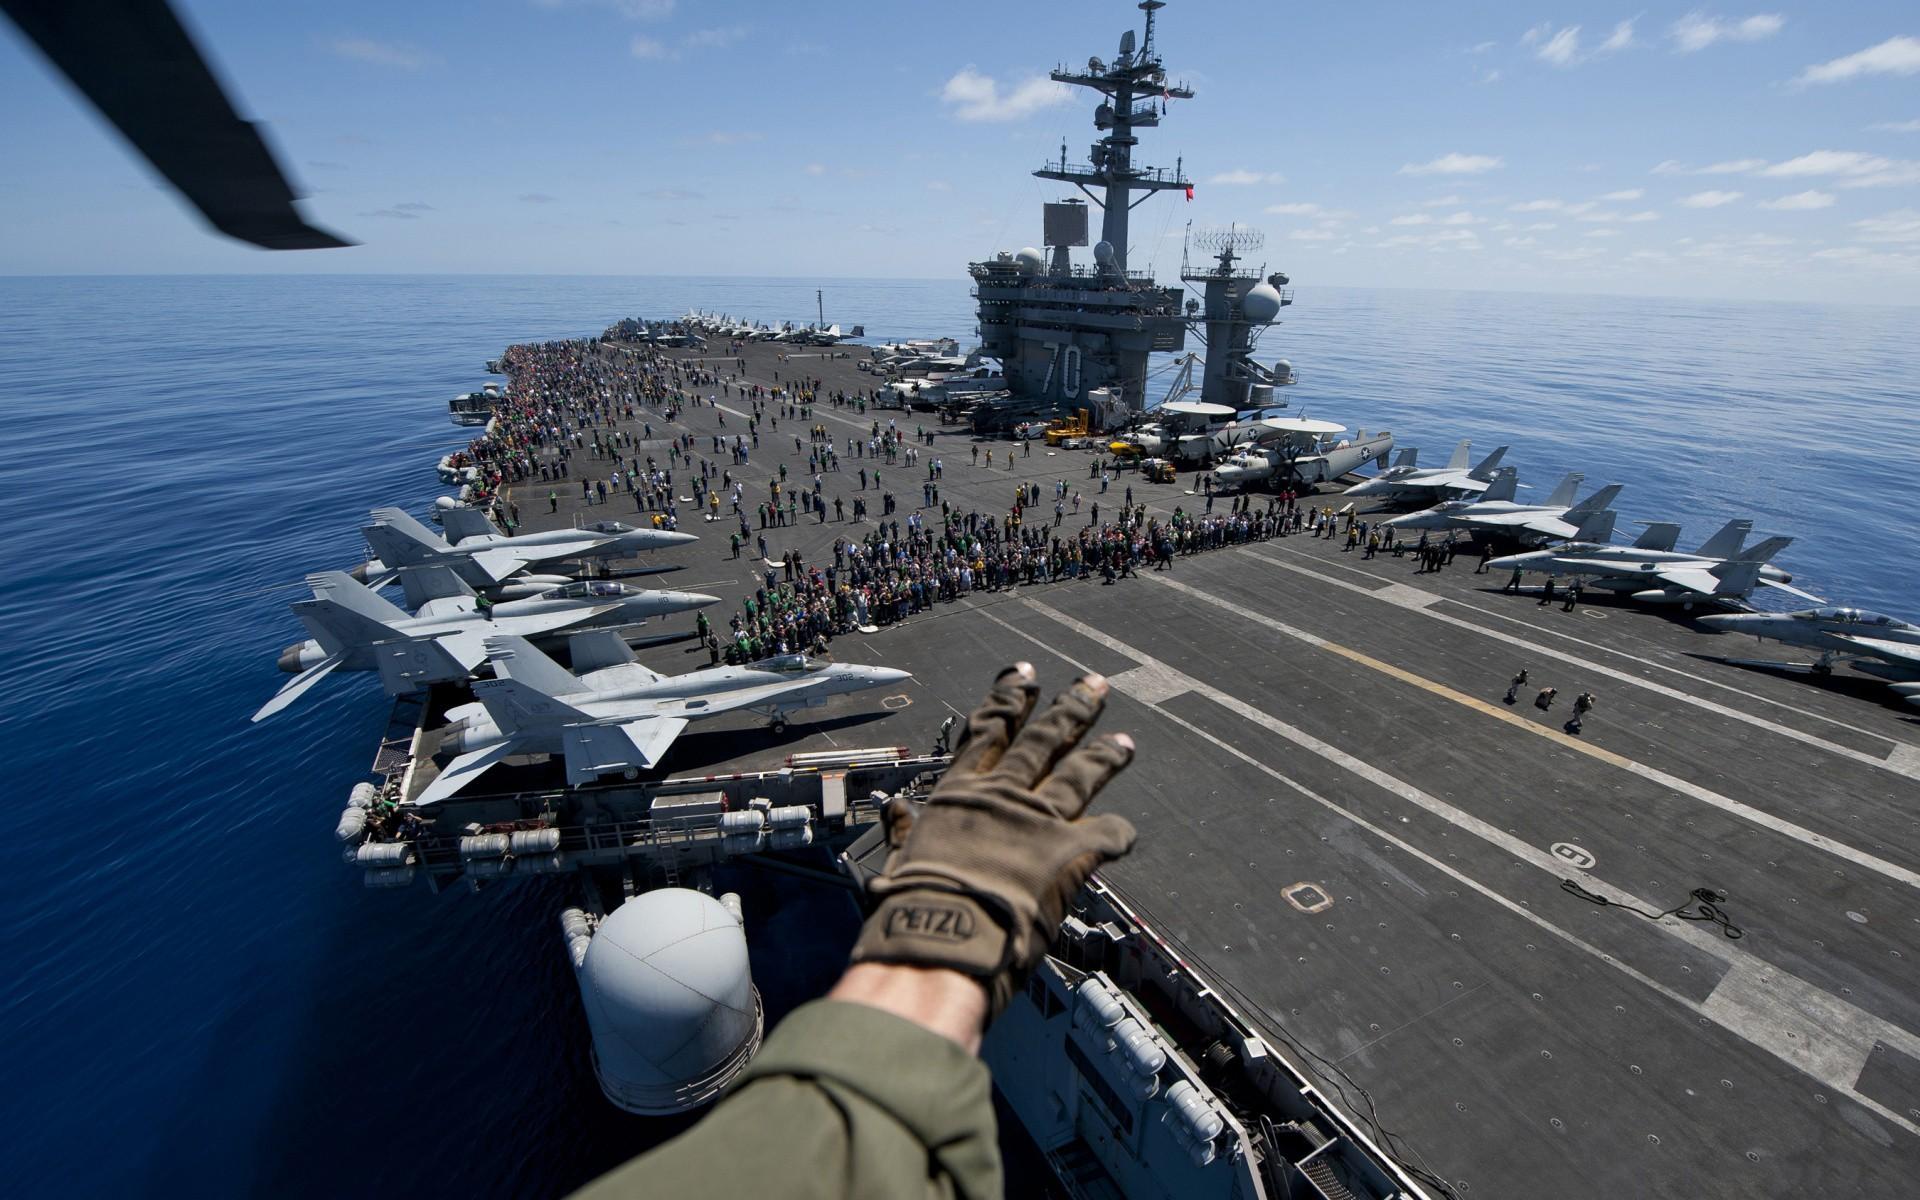 Sfondi veicolo corazzata portaerei nave da guerra - Nave portaerei ...